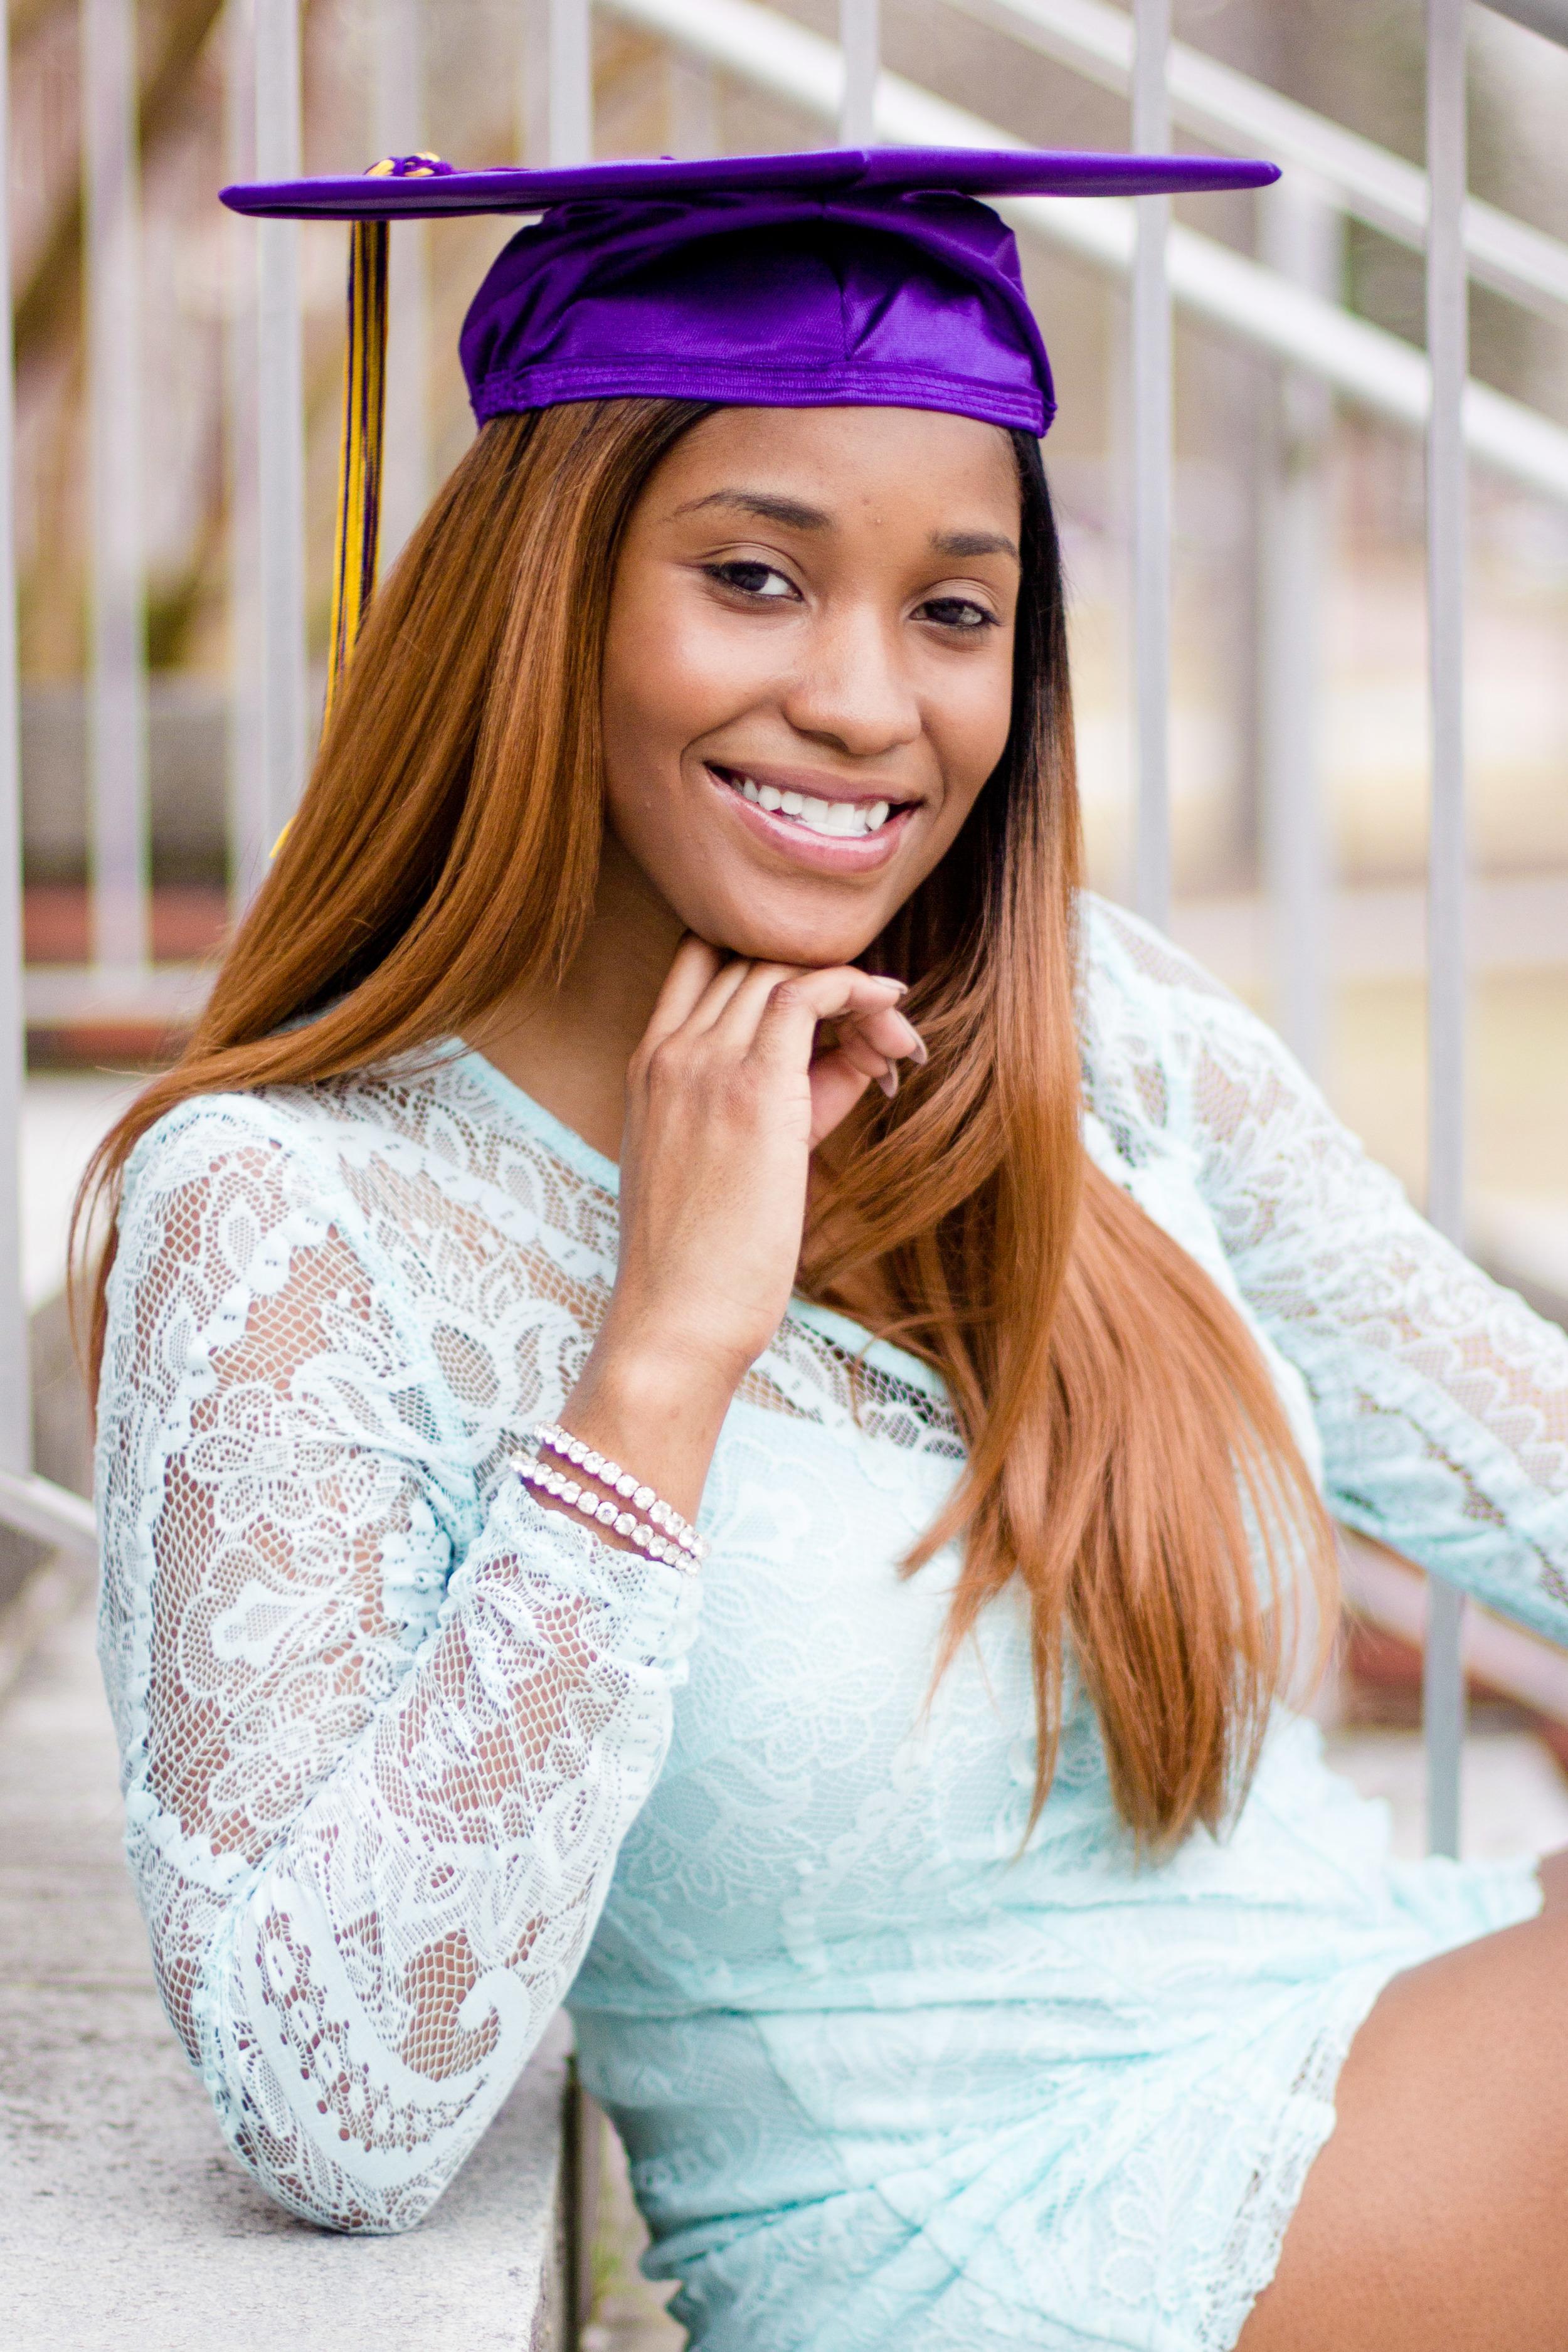 Greenville NC Portrait Photographer | Bryant Tyson Photography | Senior Portraits | East Carolina University Class of 2016